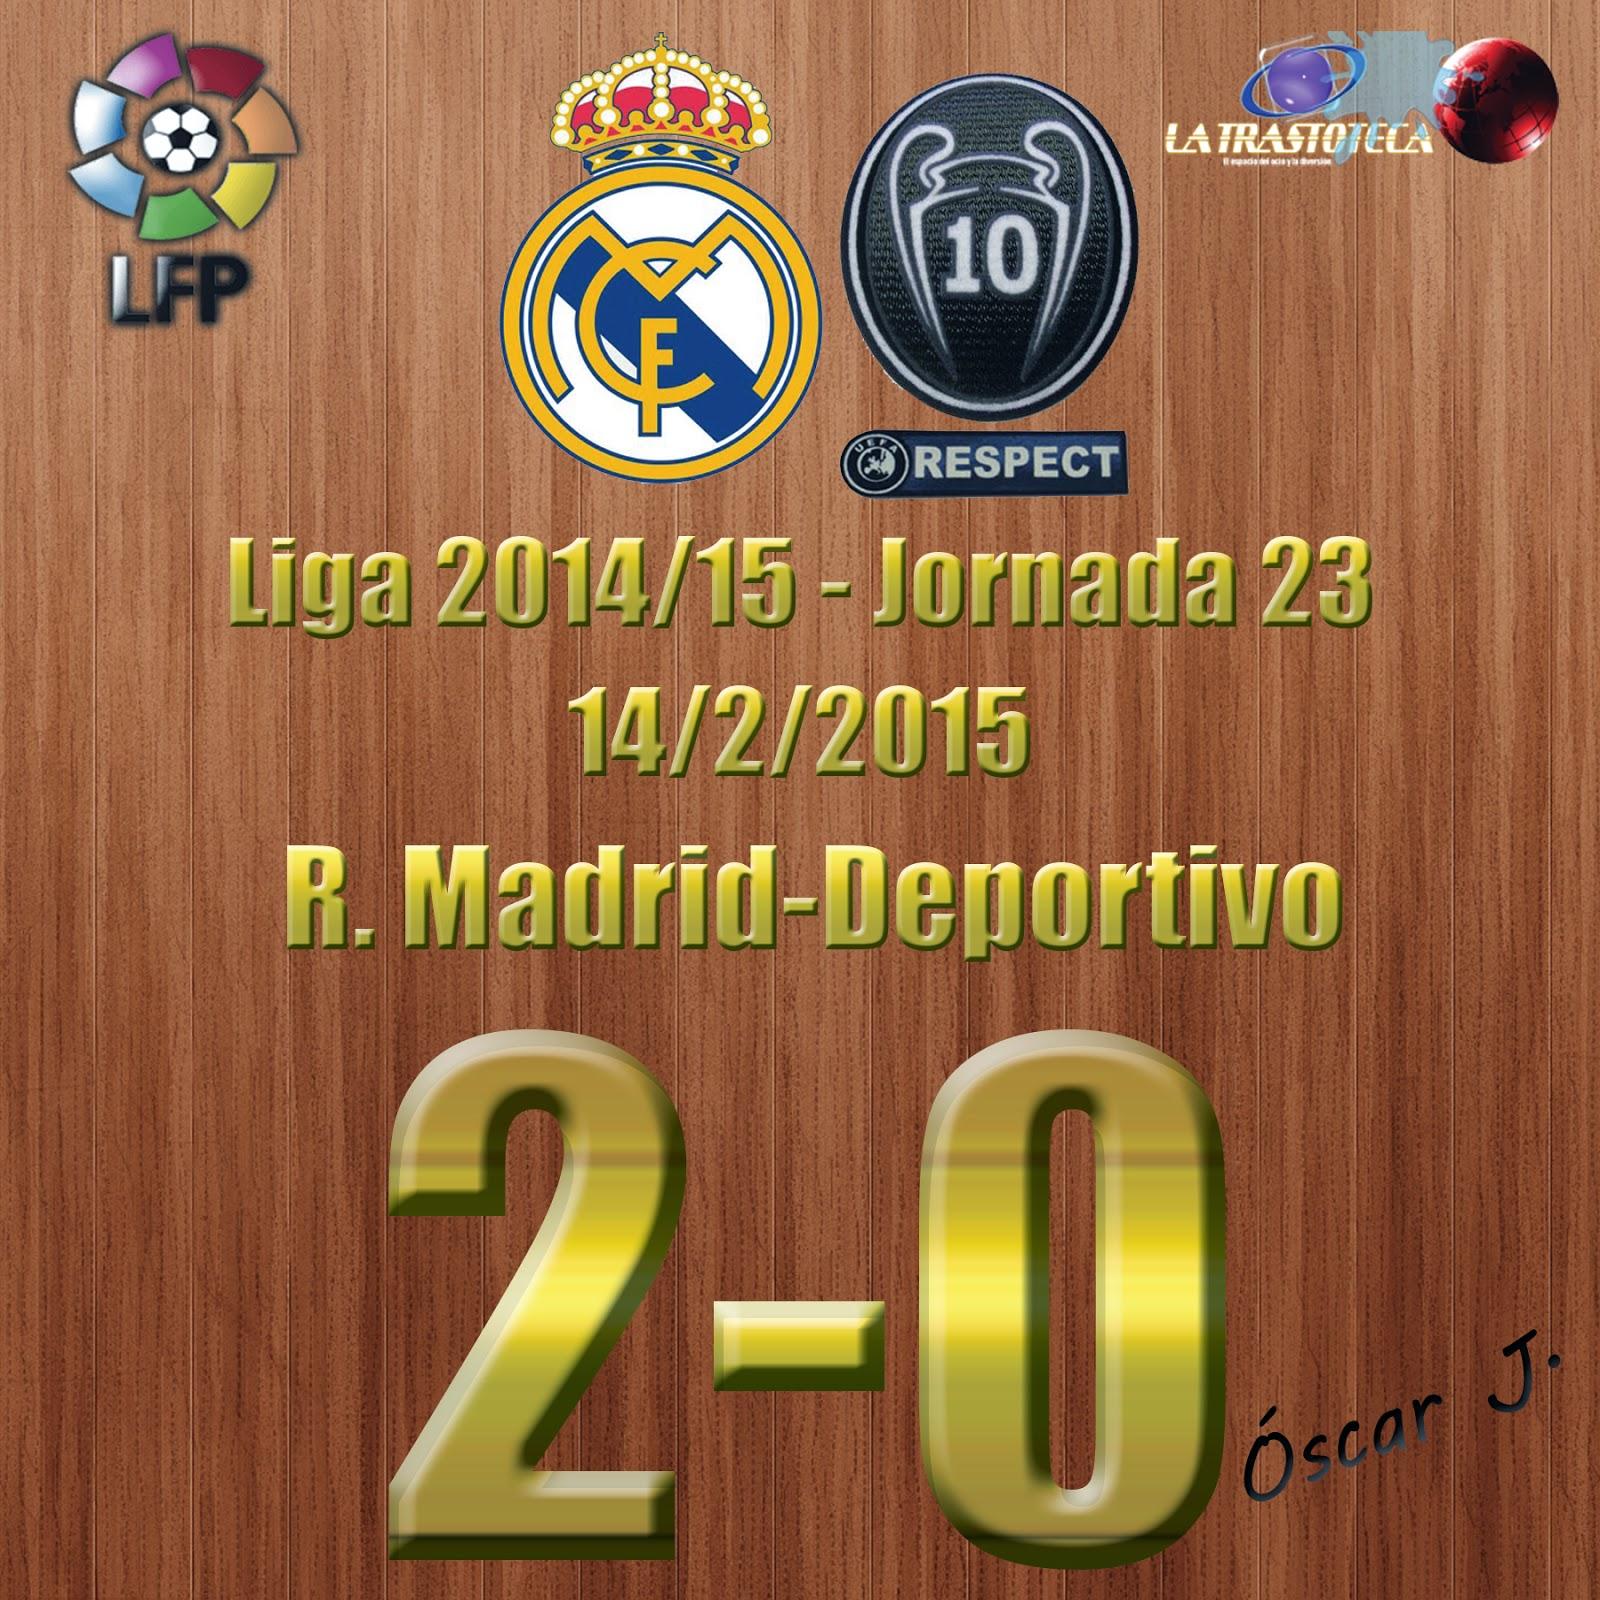 Real Madrid 2-0 Deportivo - Liga 2014/15 - Jornada 23 - (14/2/2015)